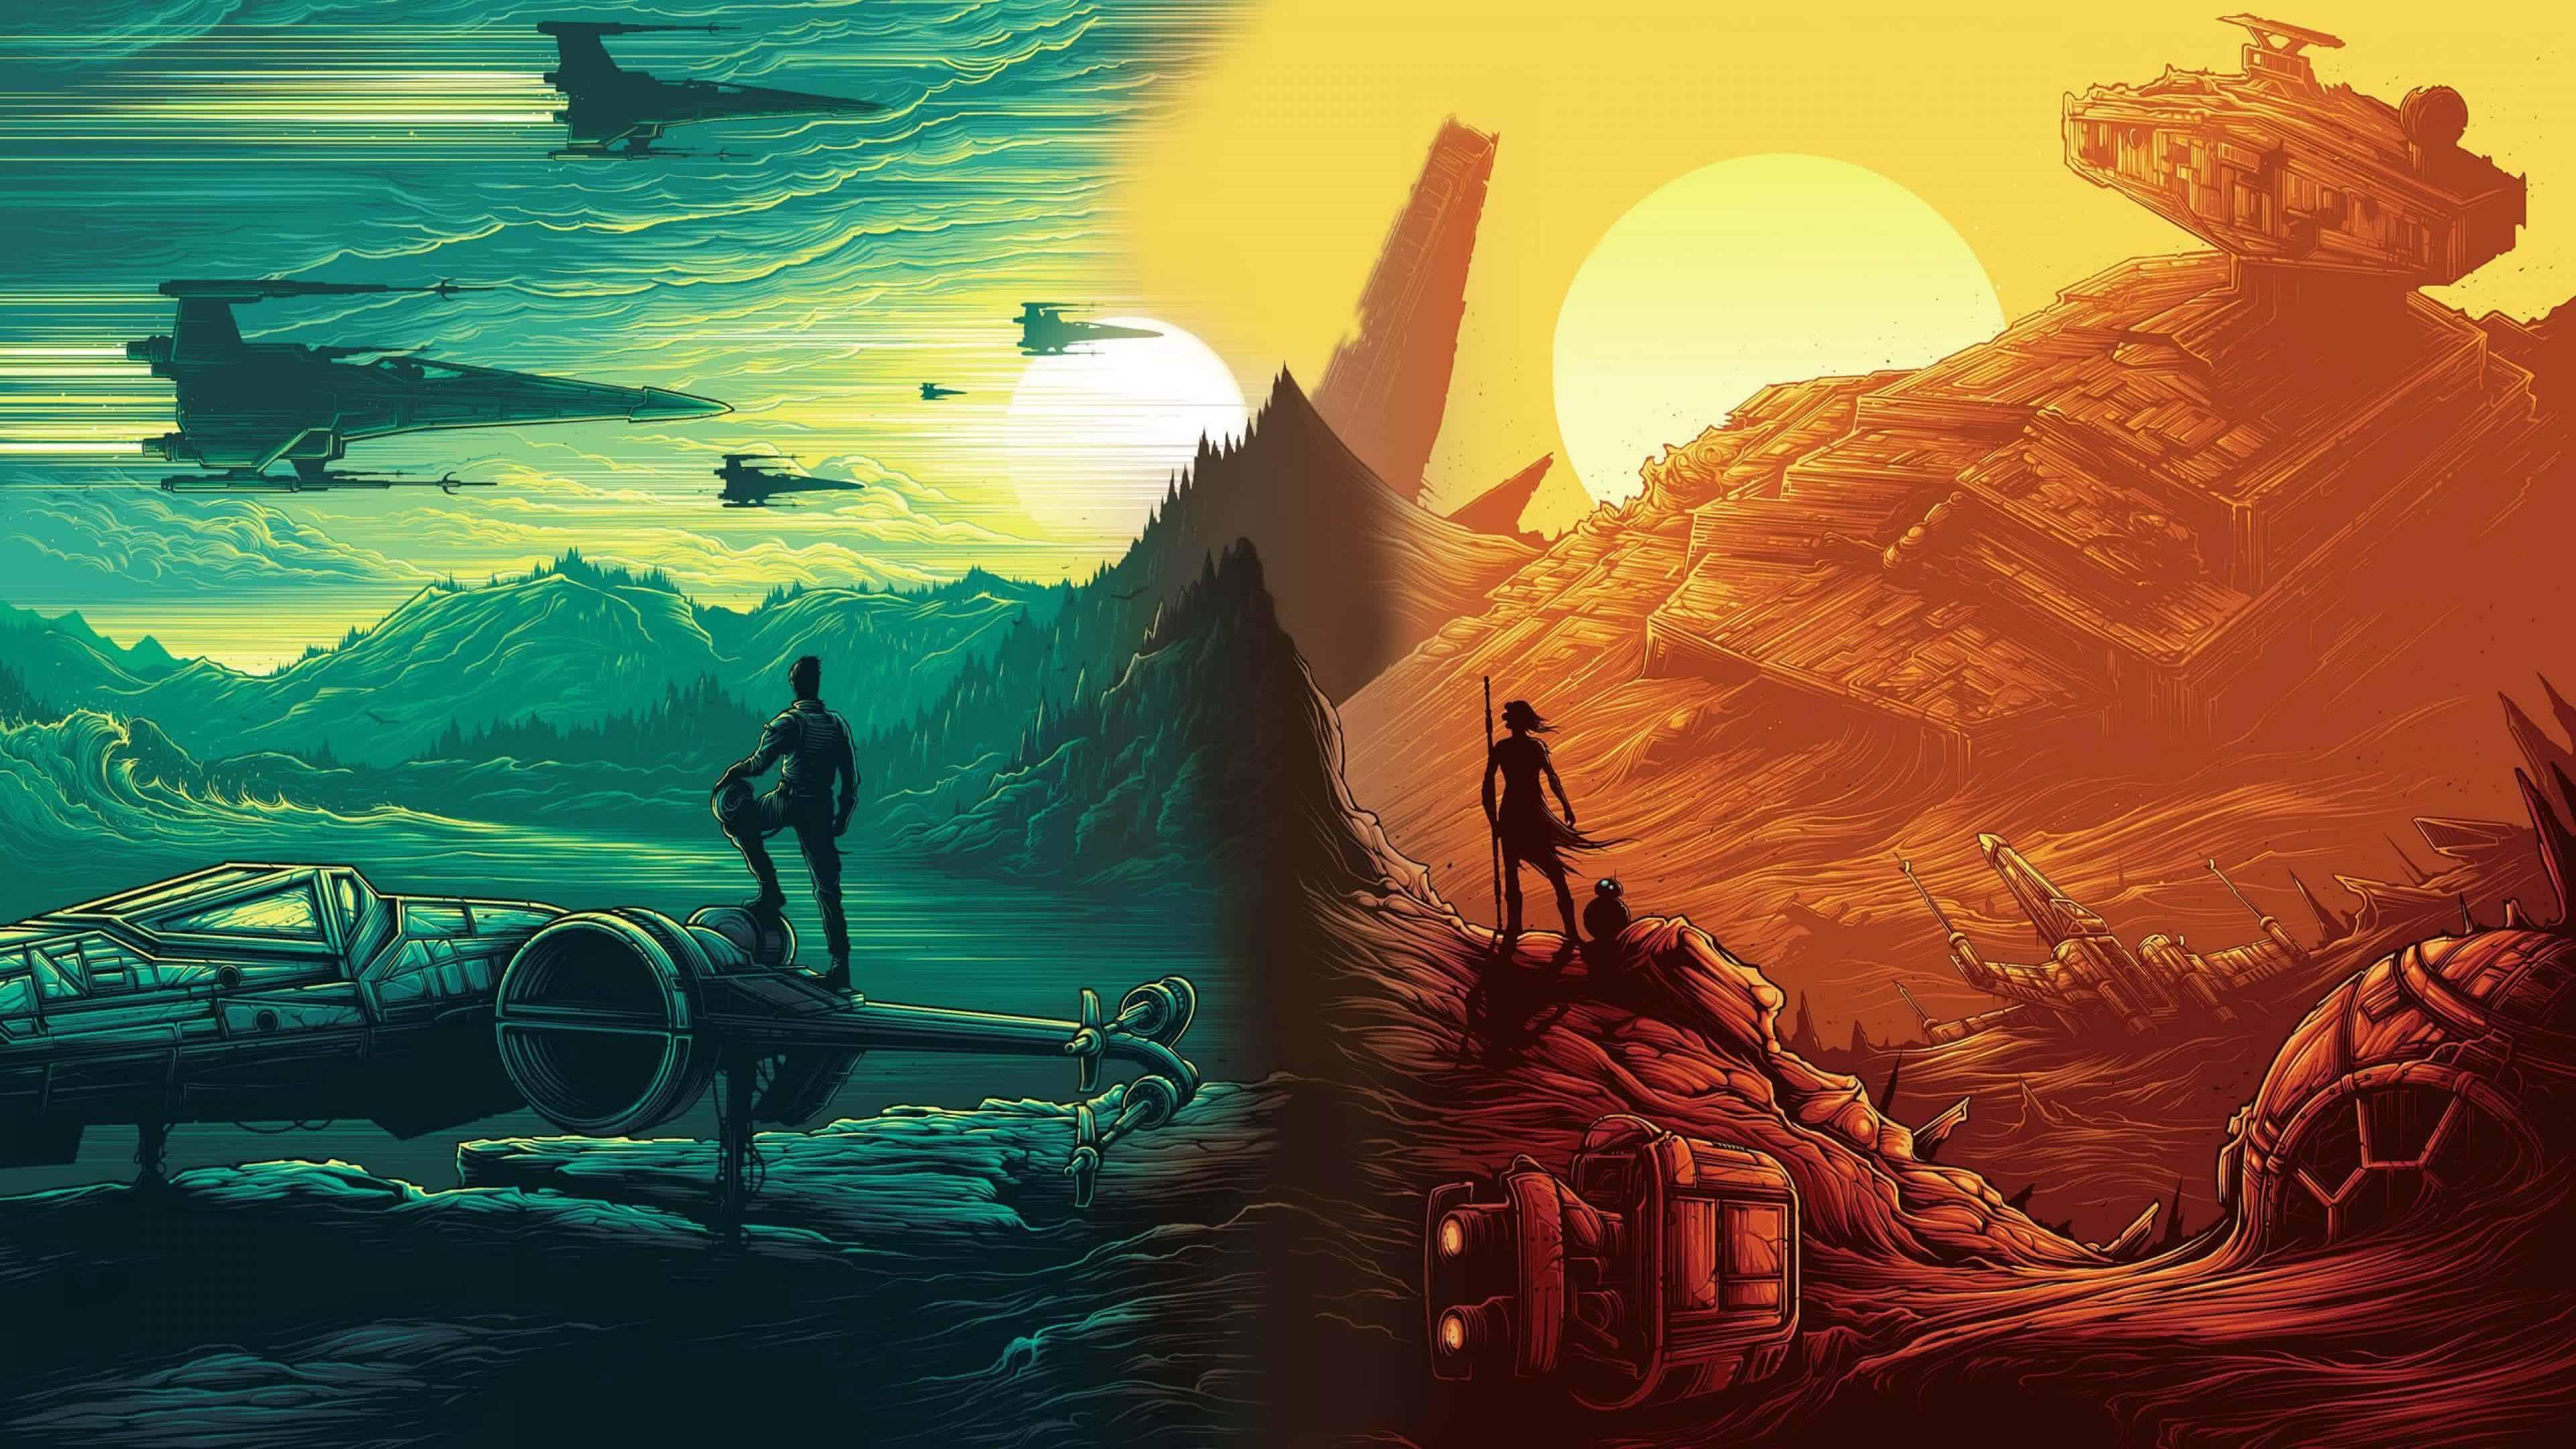 star wars the force awakens uhd 4k wallpaper | pixelz